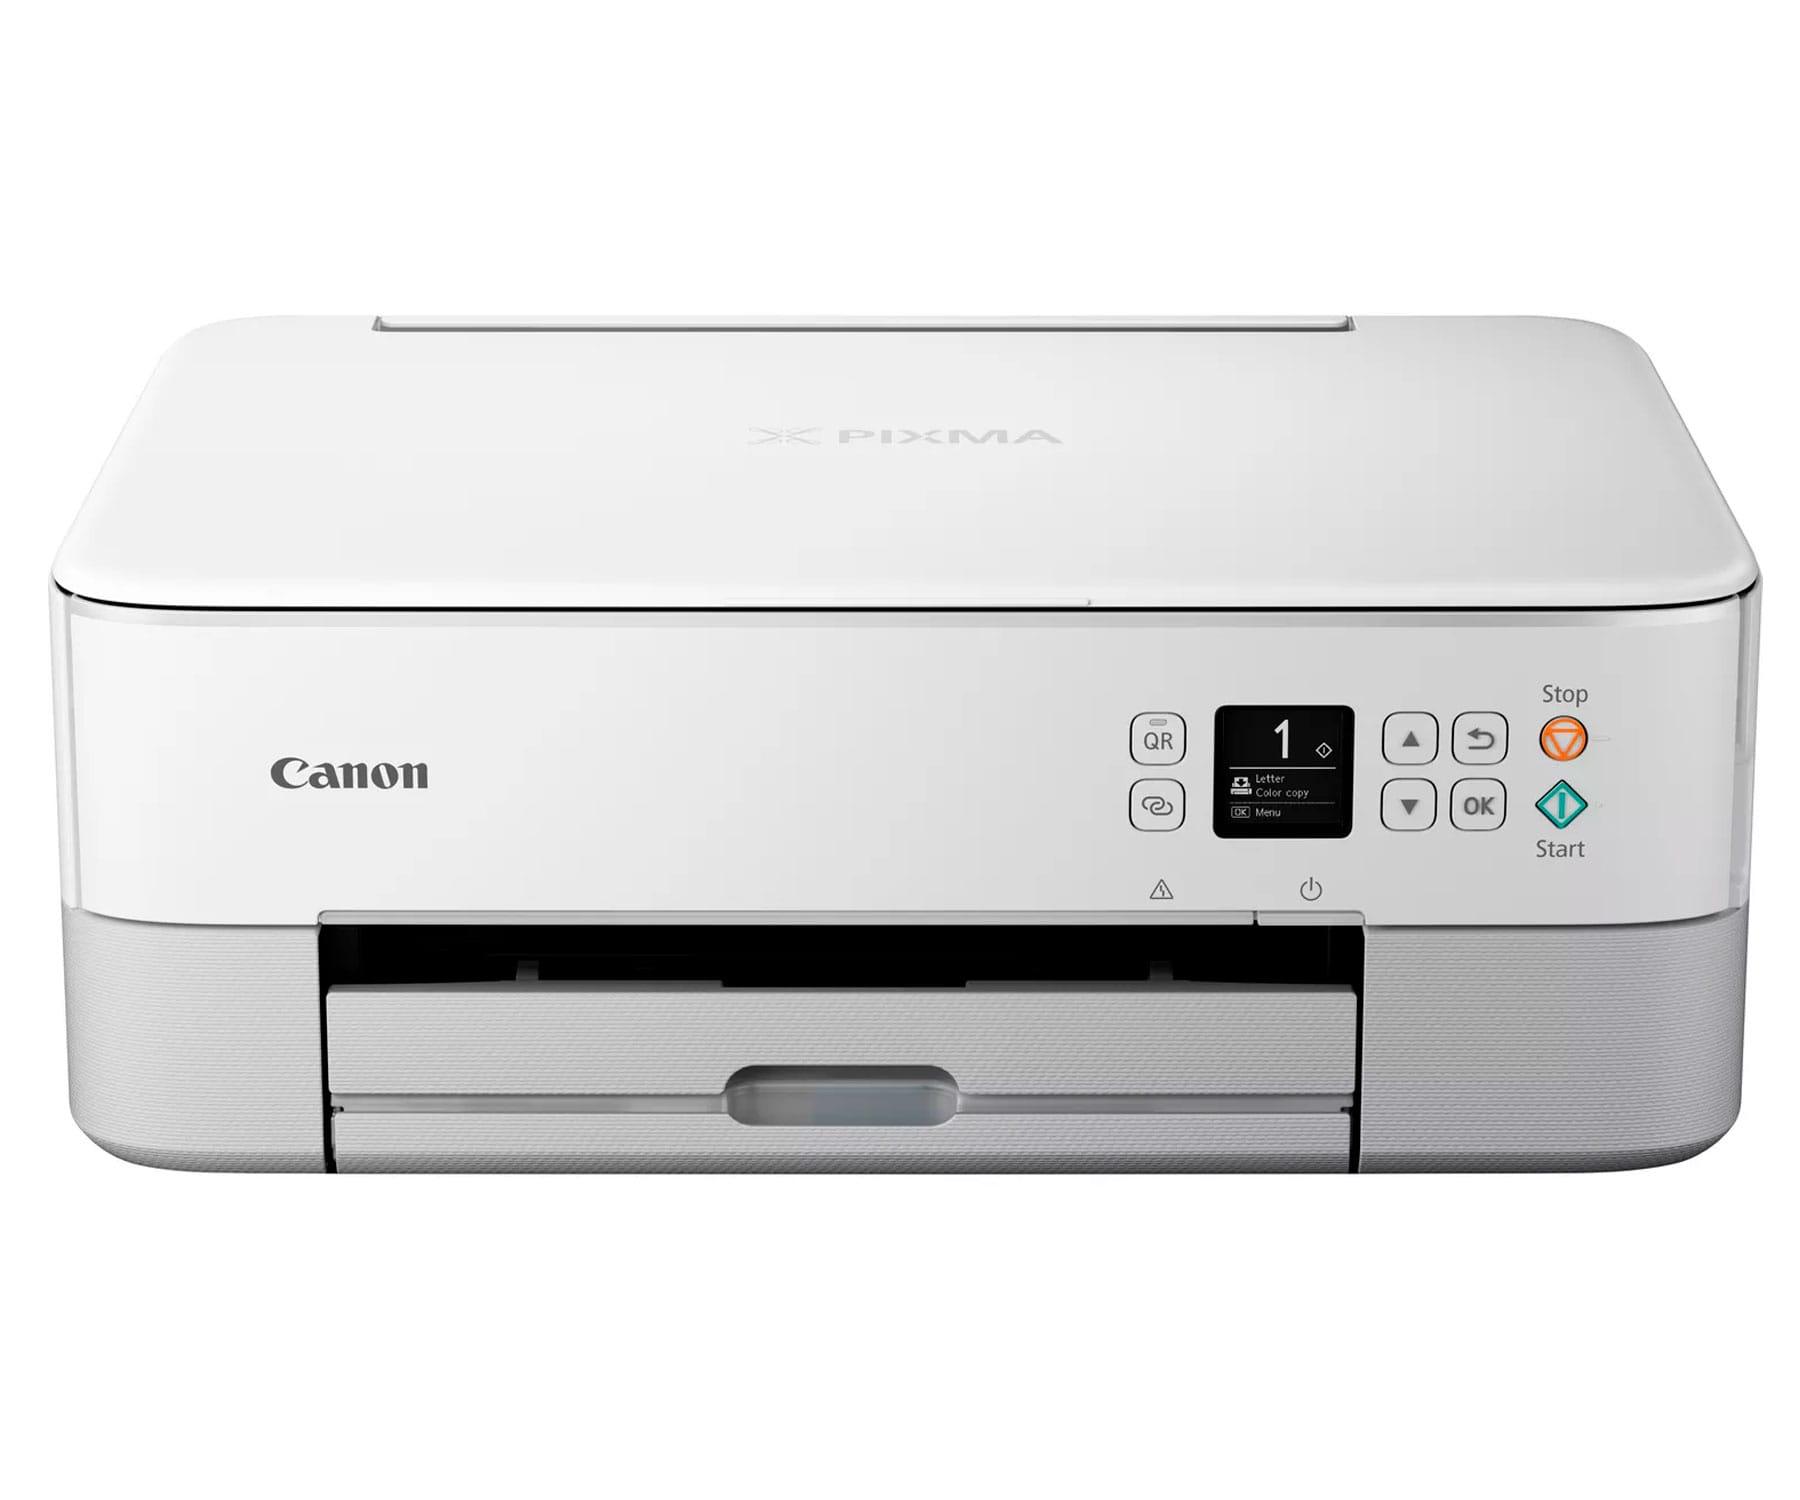 Canon PIXMA TS5351 Blanca/ Impresora multifunción inalámbrica/